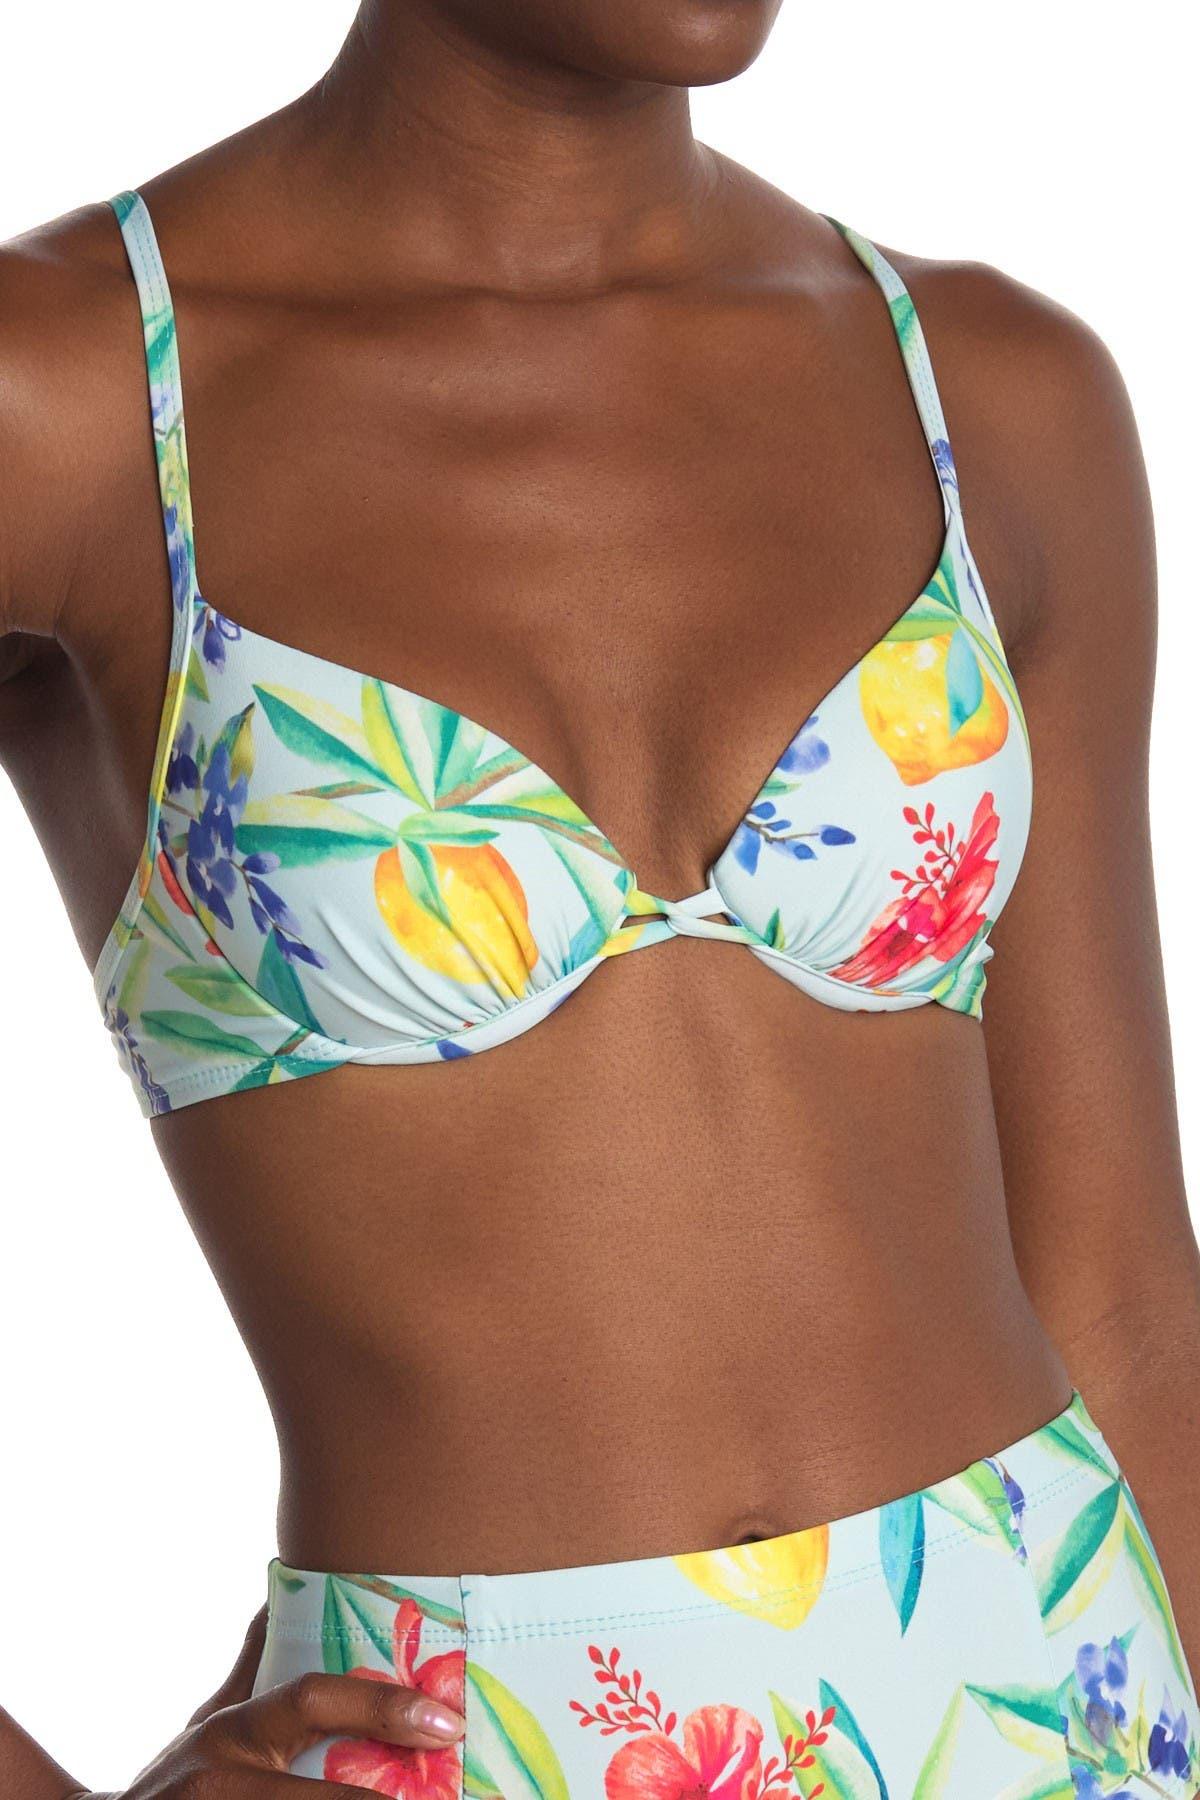 Image of Athena Simple Pleasures Swim bra